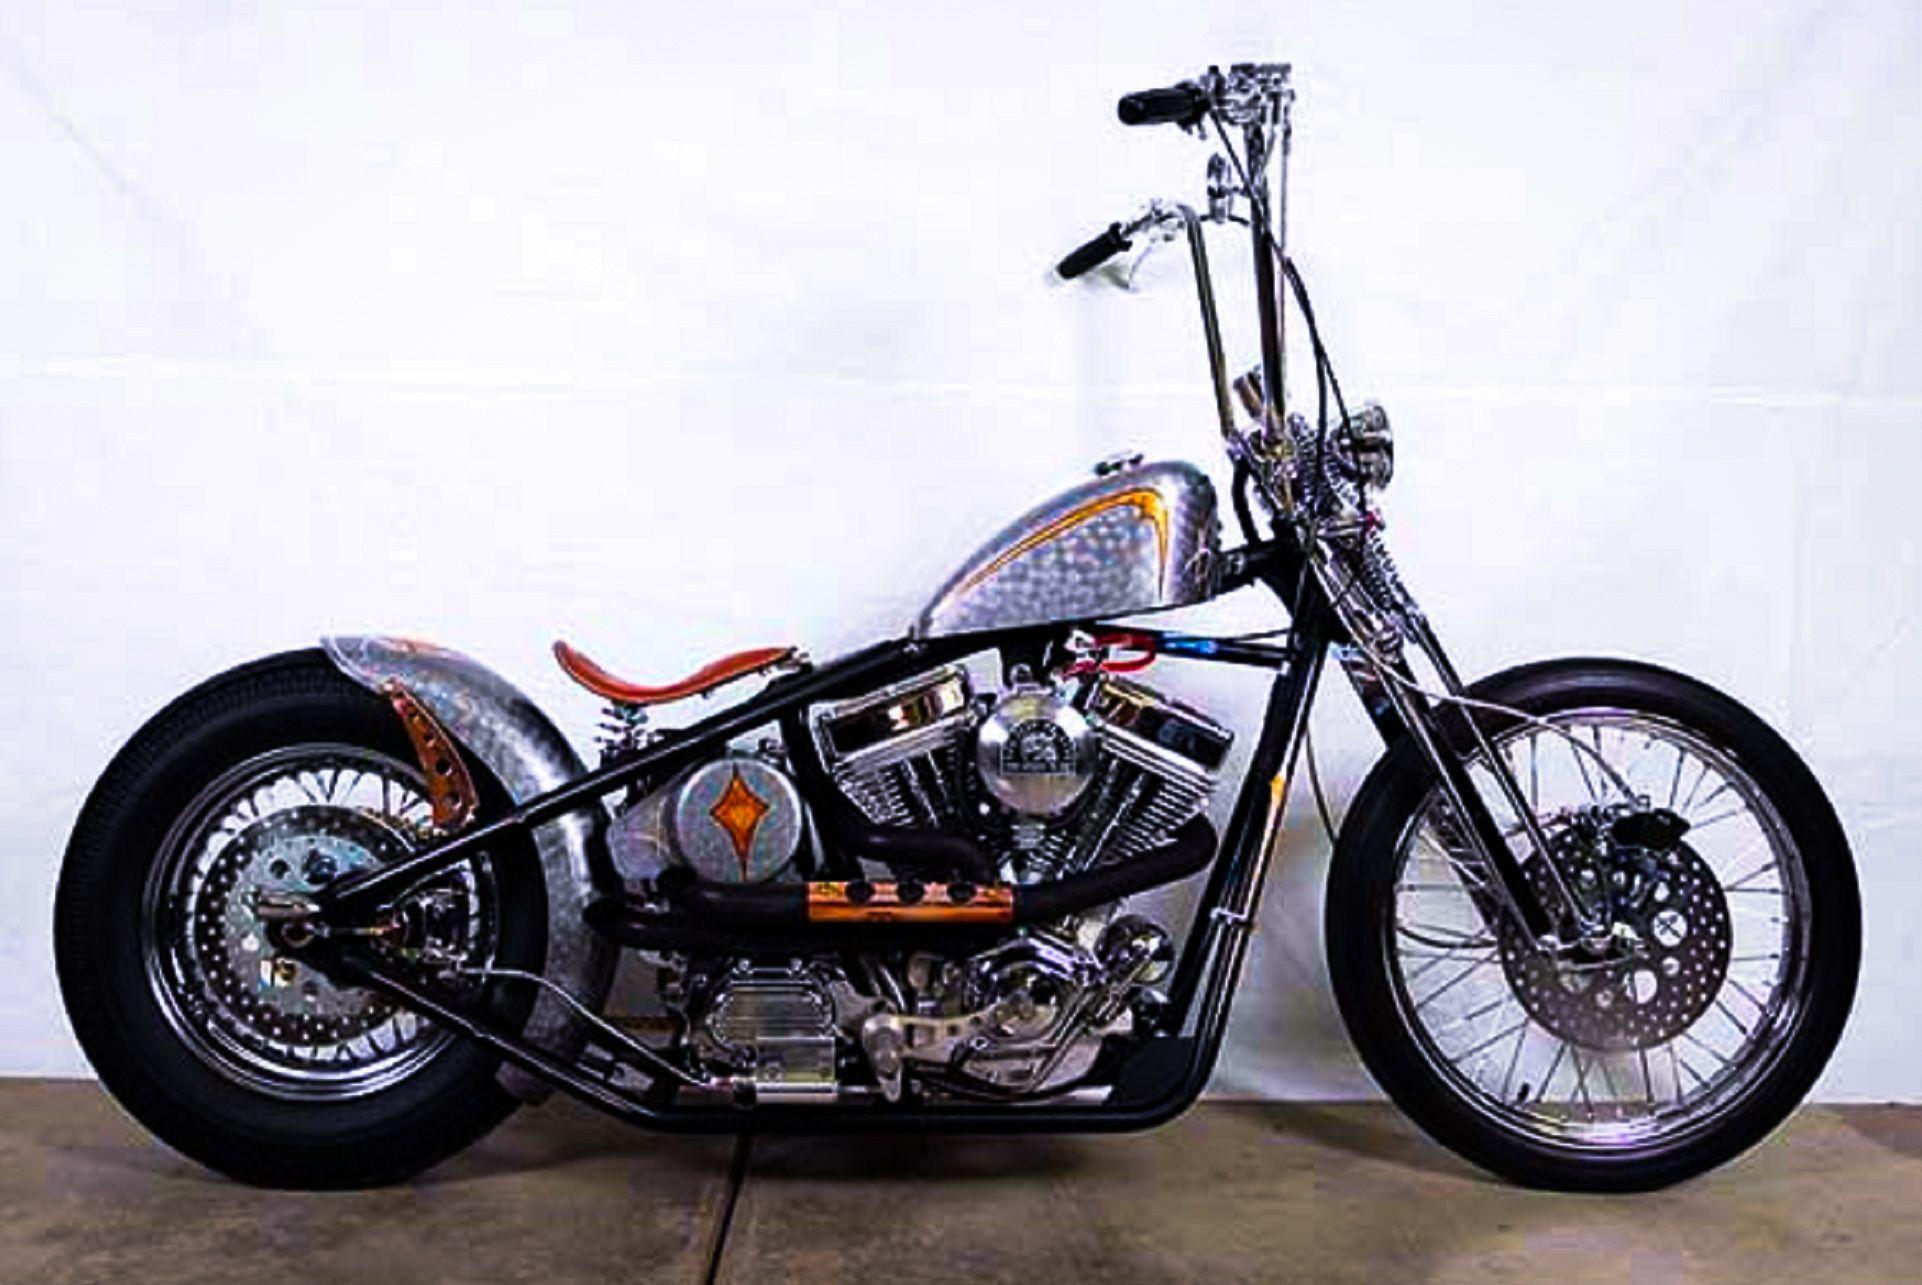 Ape Hanger Classic Bobber Motorcycle Http Usabobbers Com